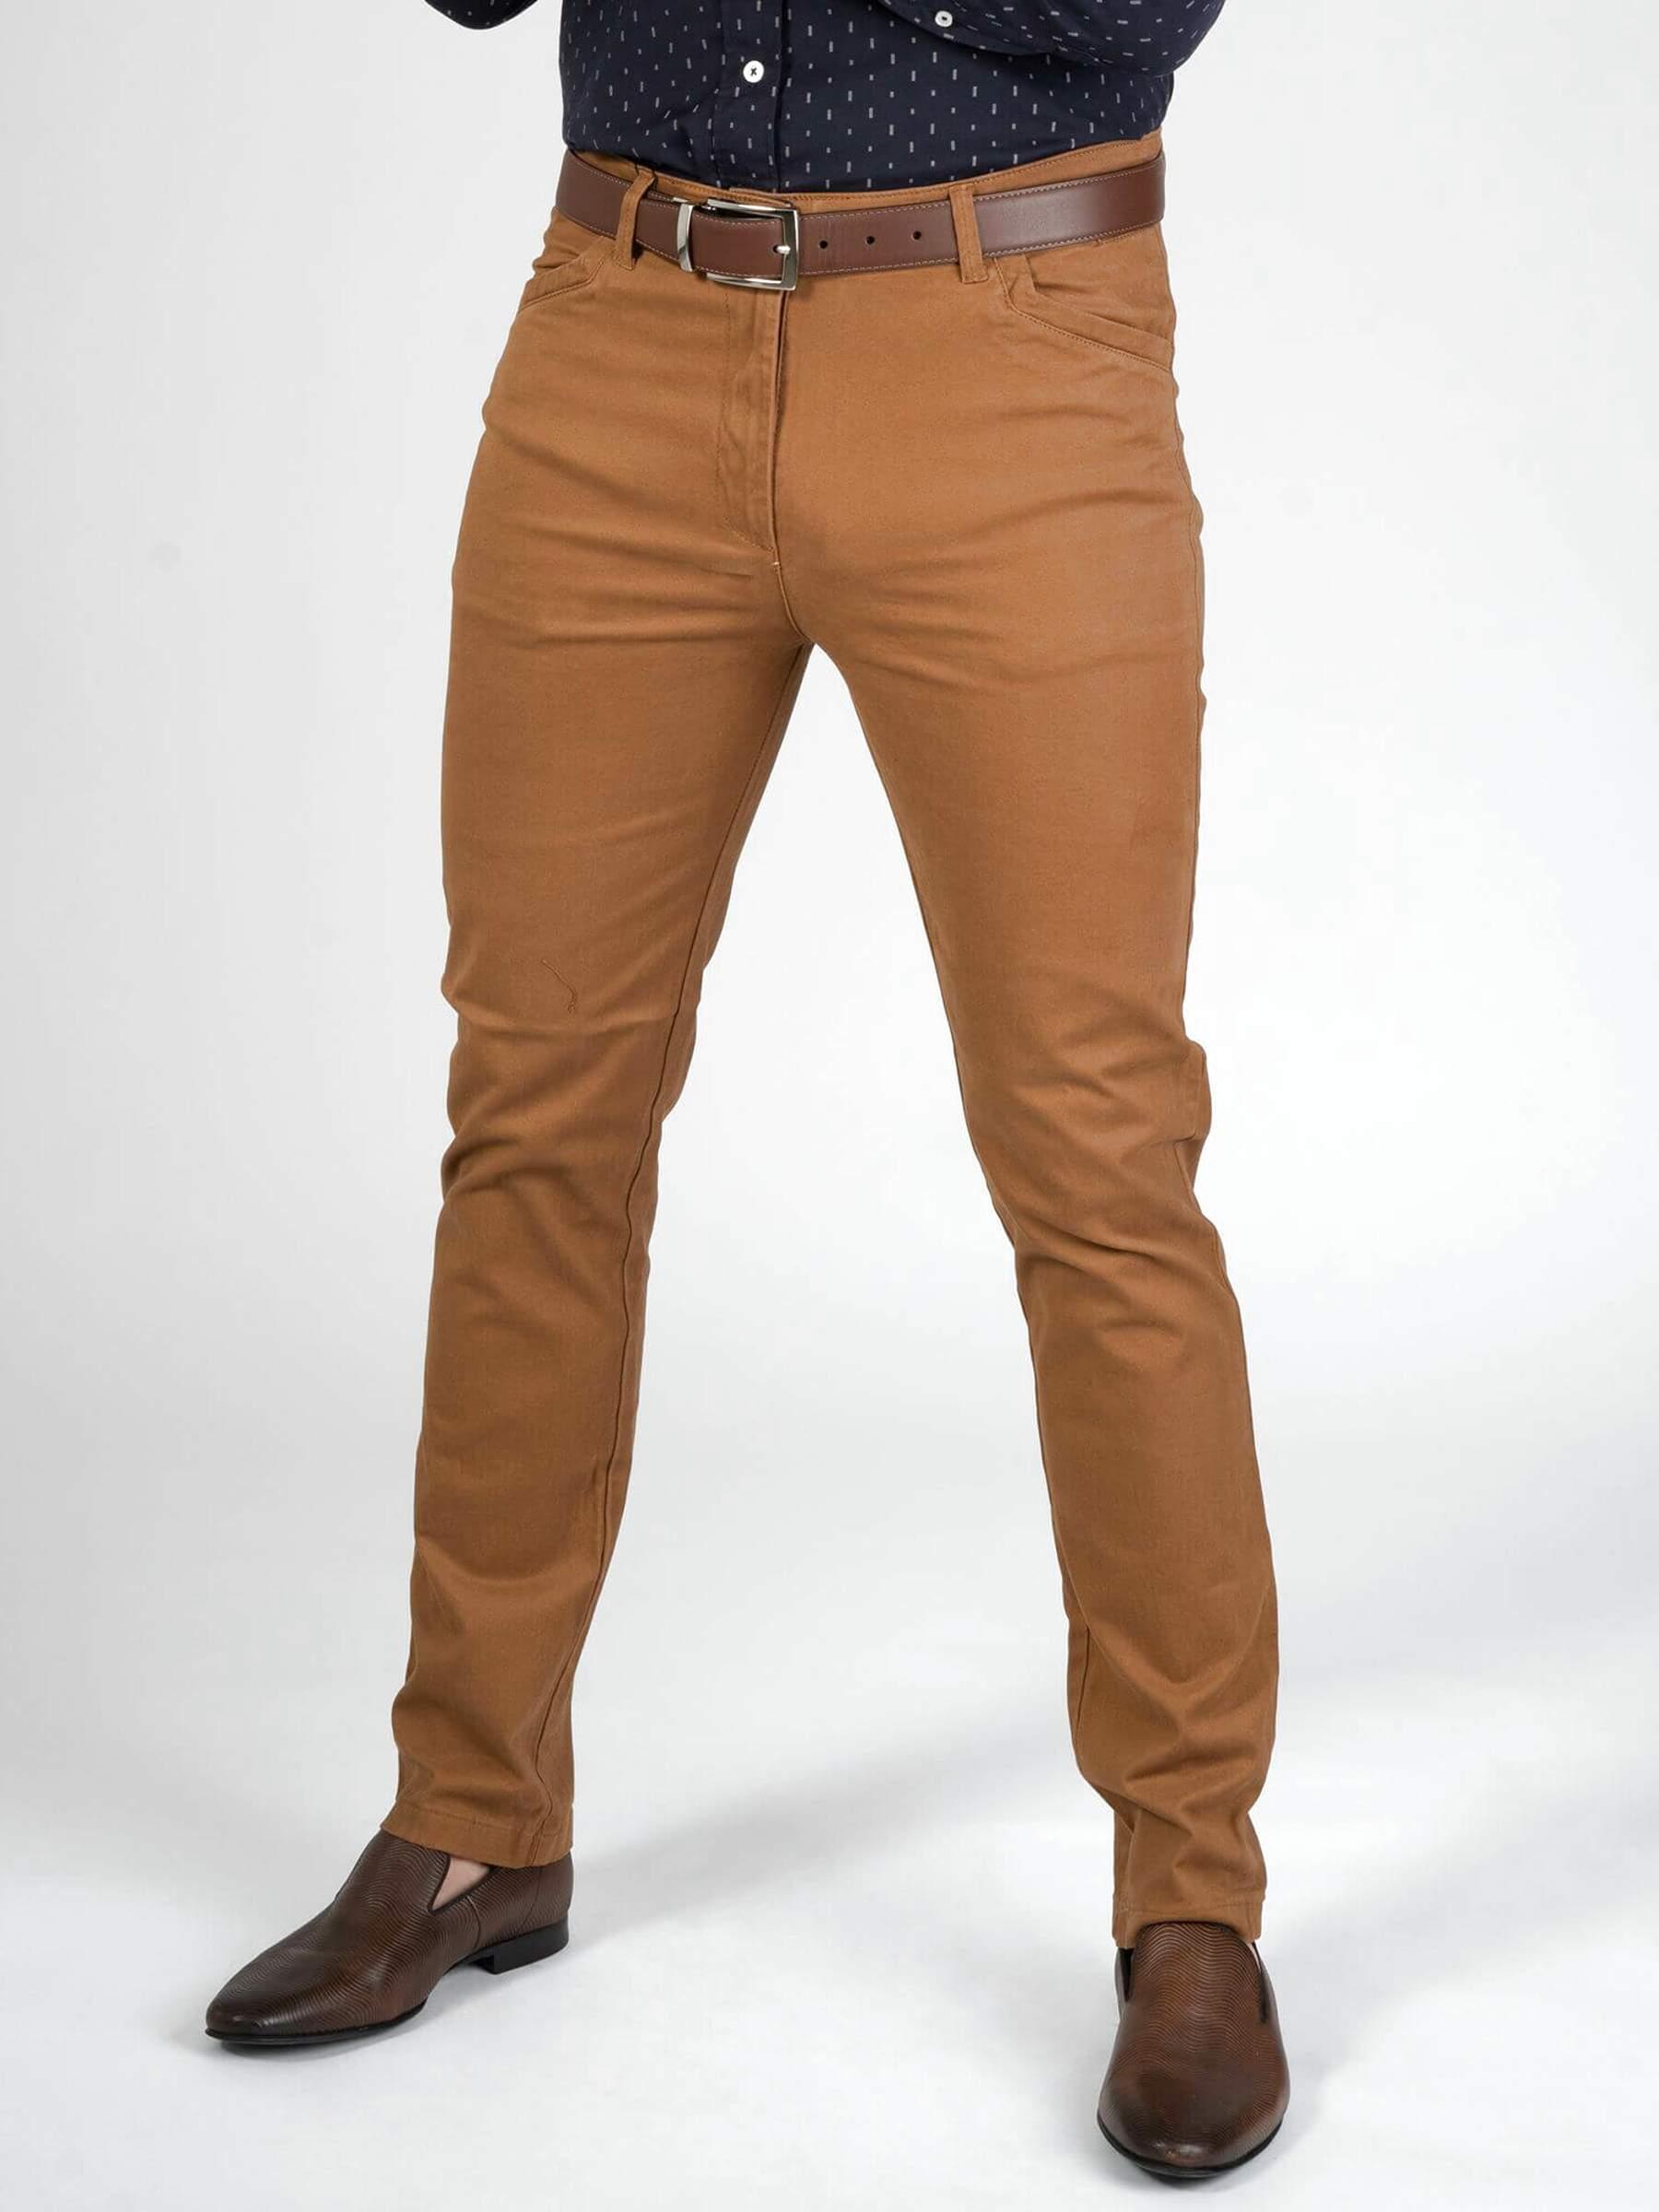 Venta De Pantalon Gabardina Segunda Mano